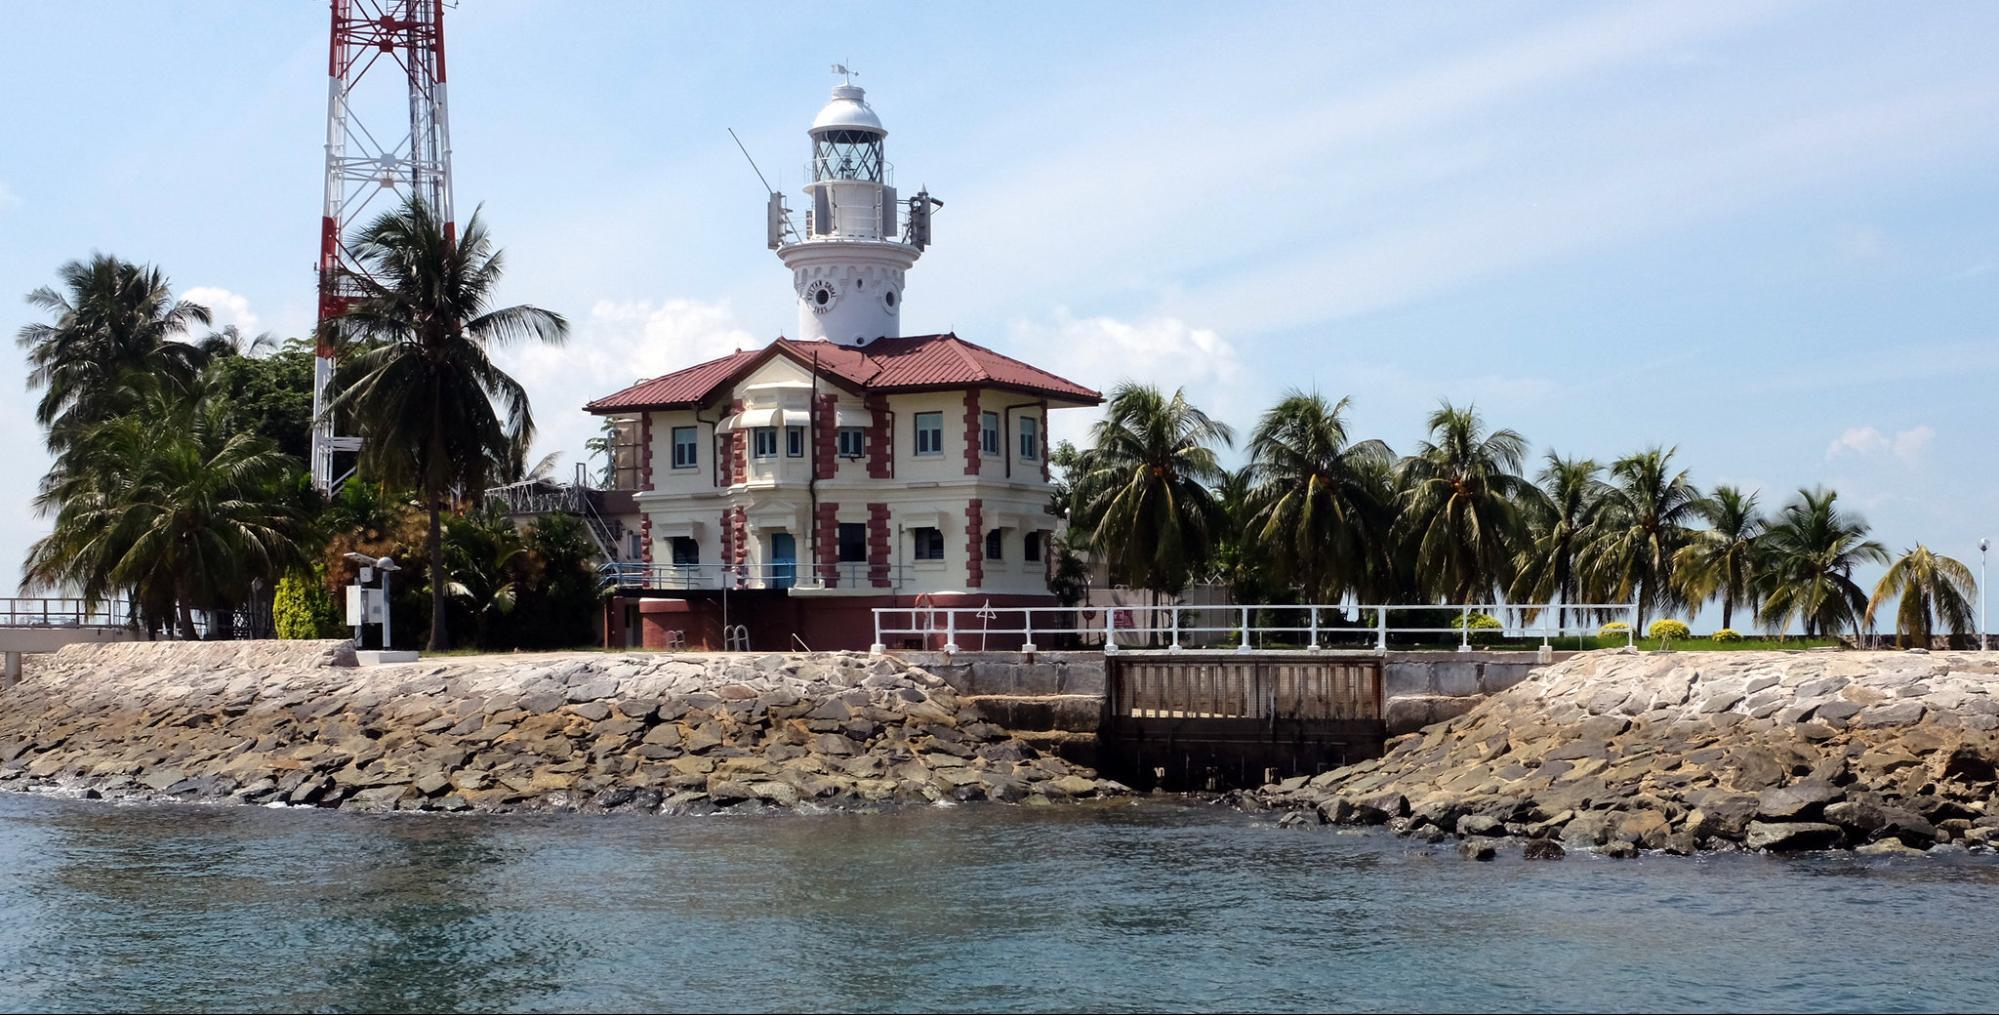 sultan shoal lighthouse